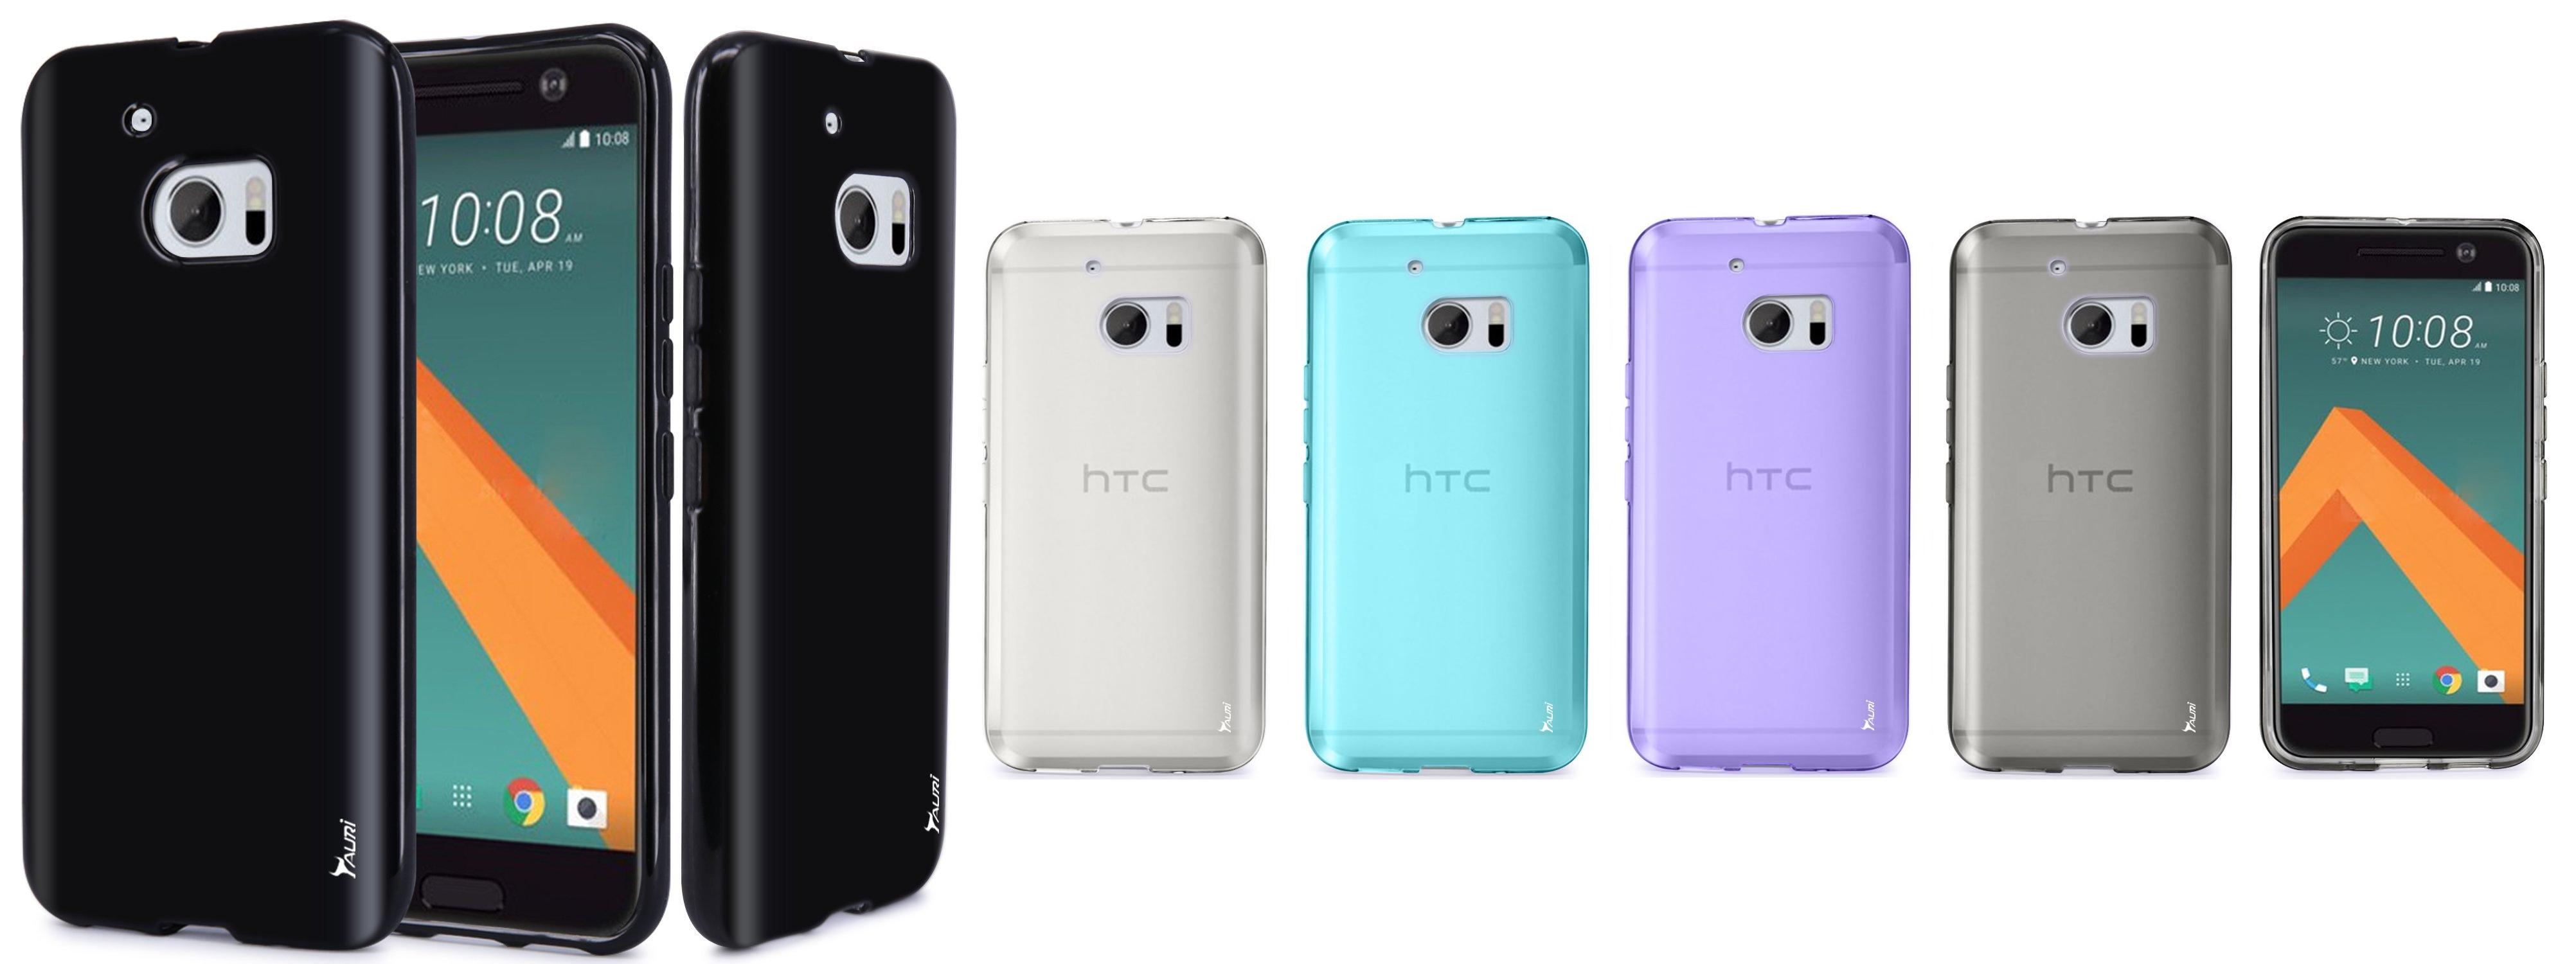 best htc 10 case Ultra Slim Thin Clear Flexible Soft TPU Gel Skin Protective Case Cover